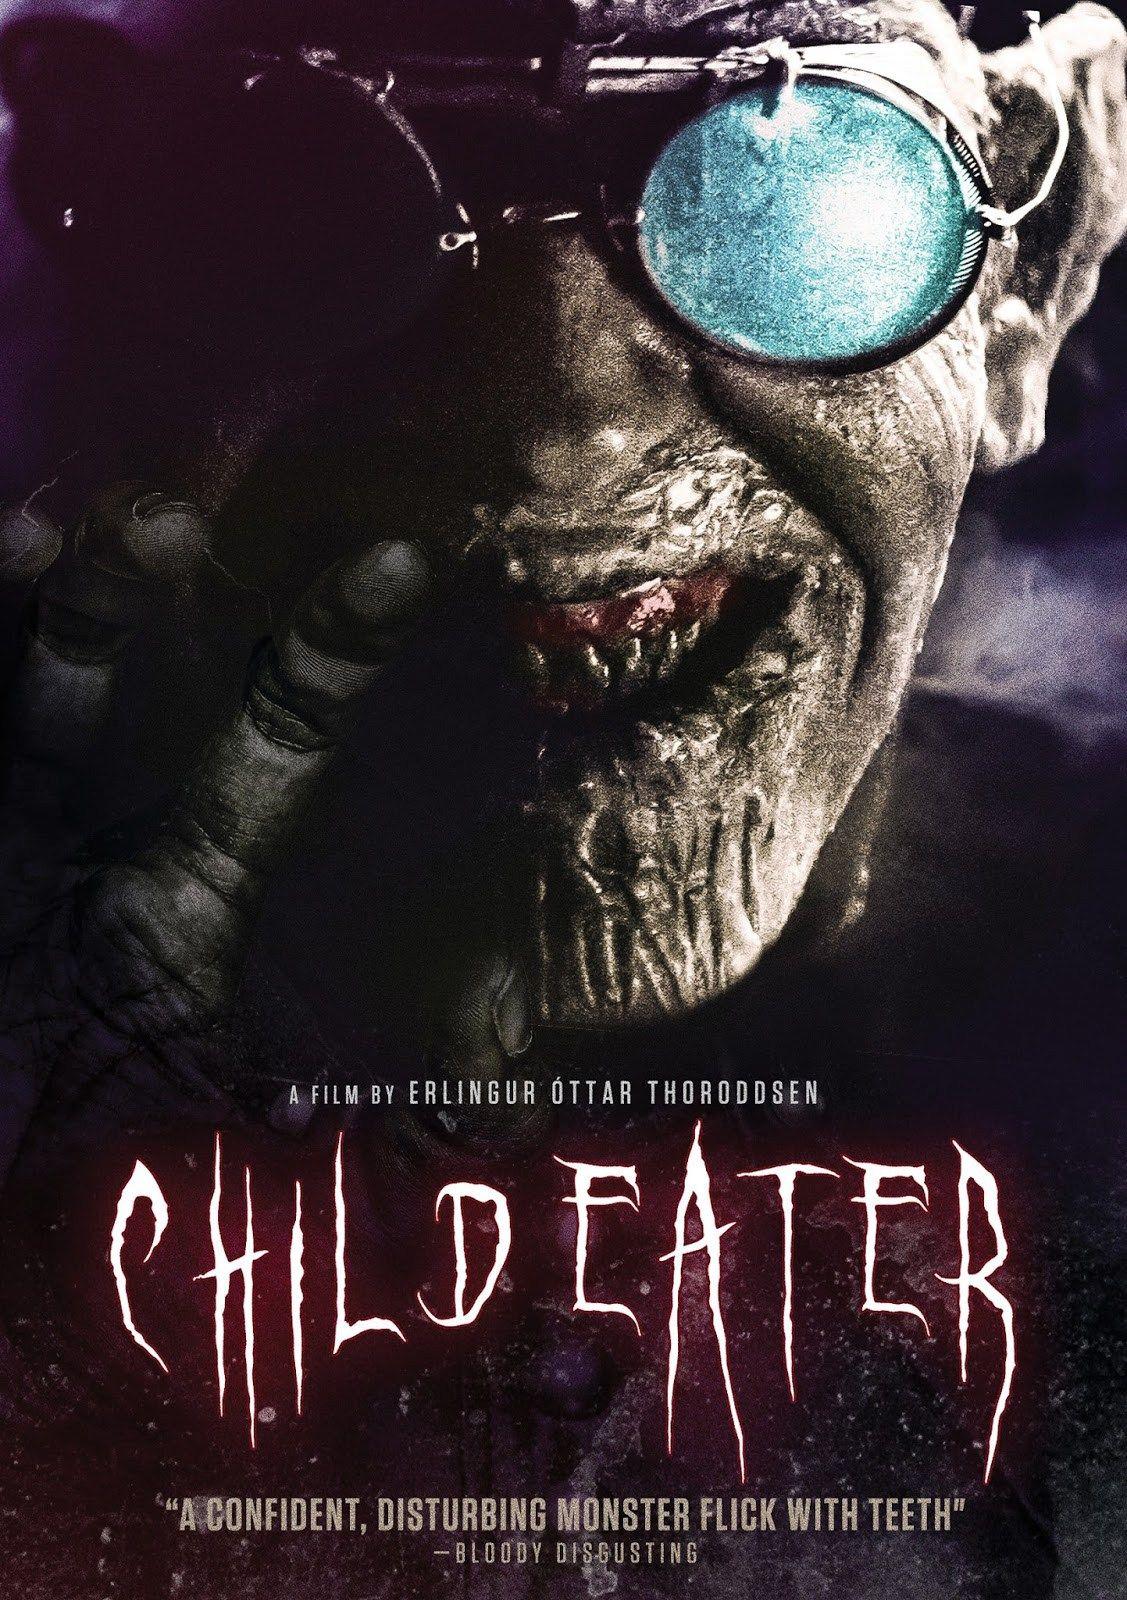 child eater full movie watch online